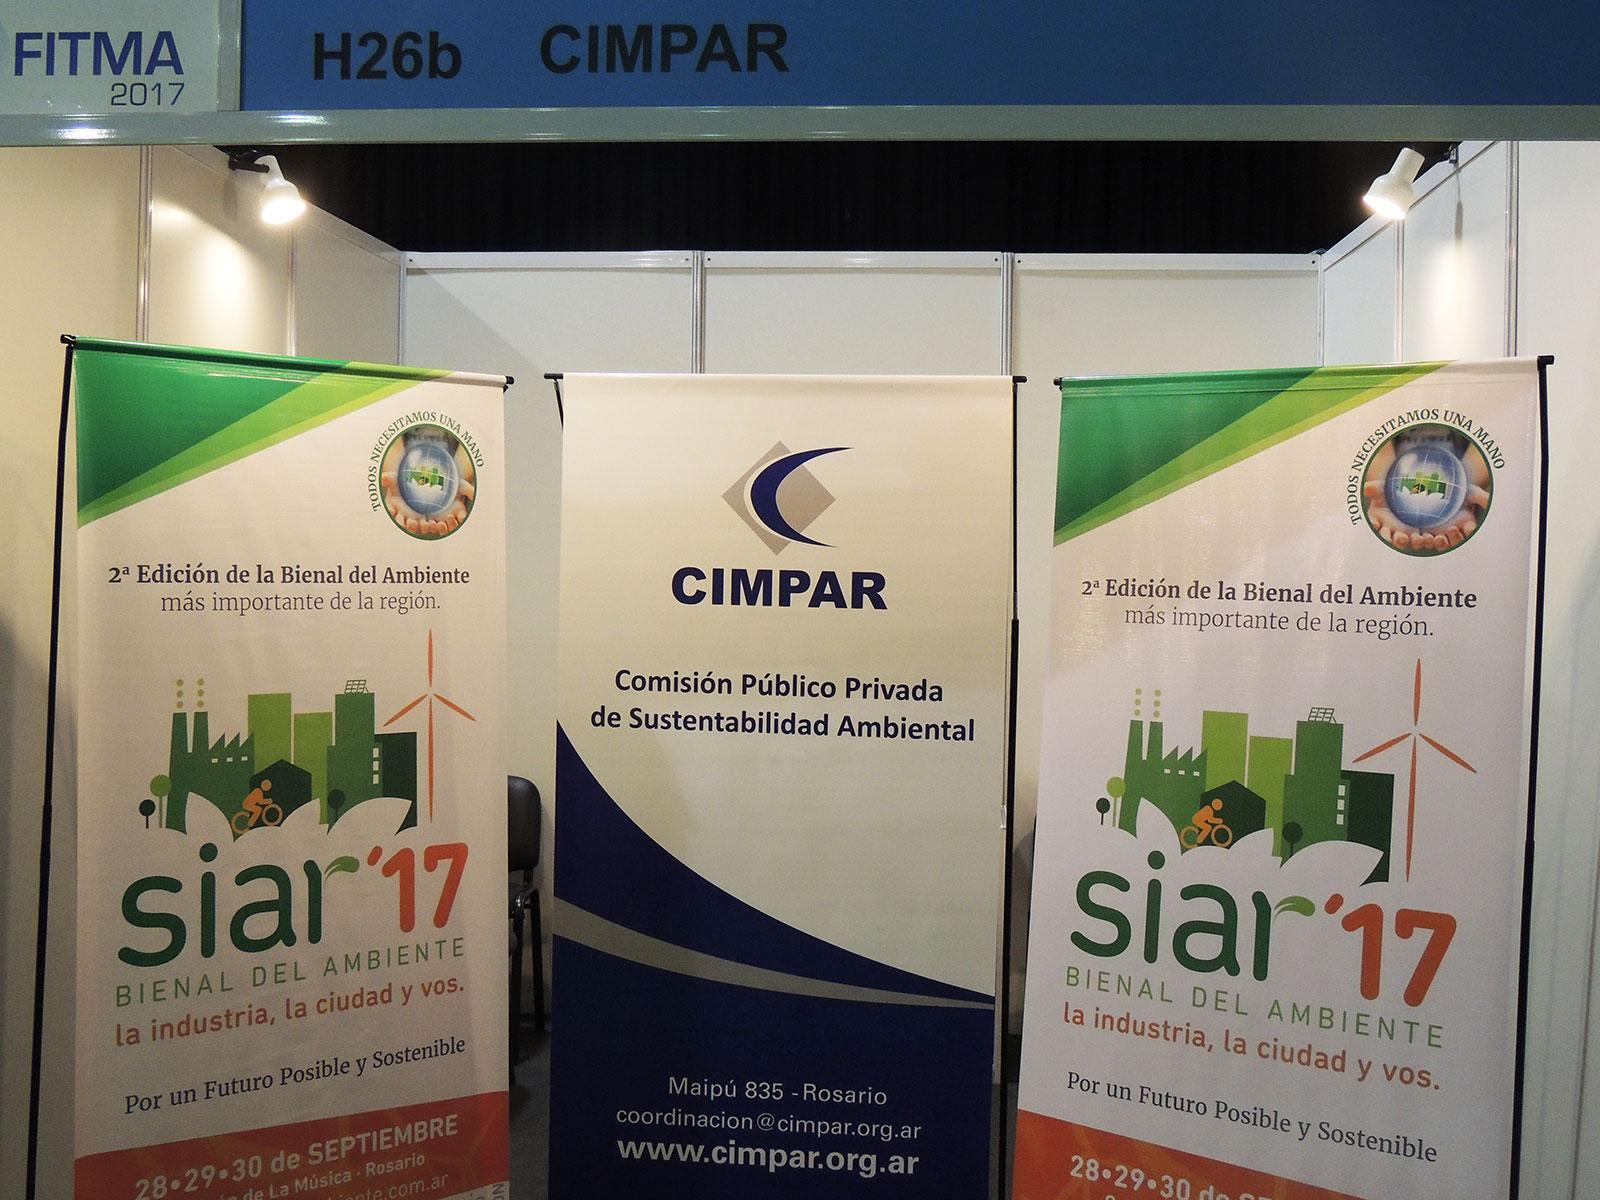 SIAR estuvo presente en FITMA 2017